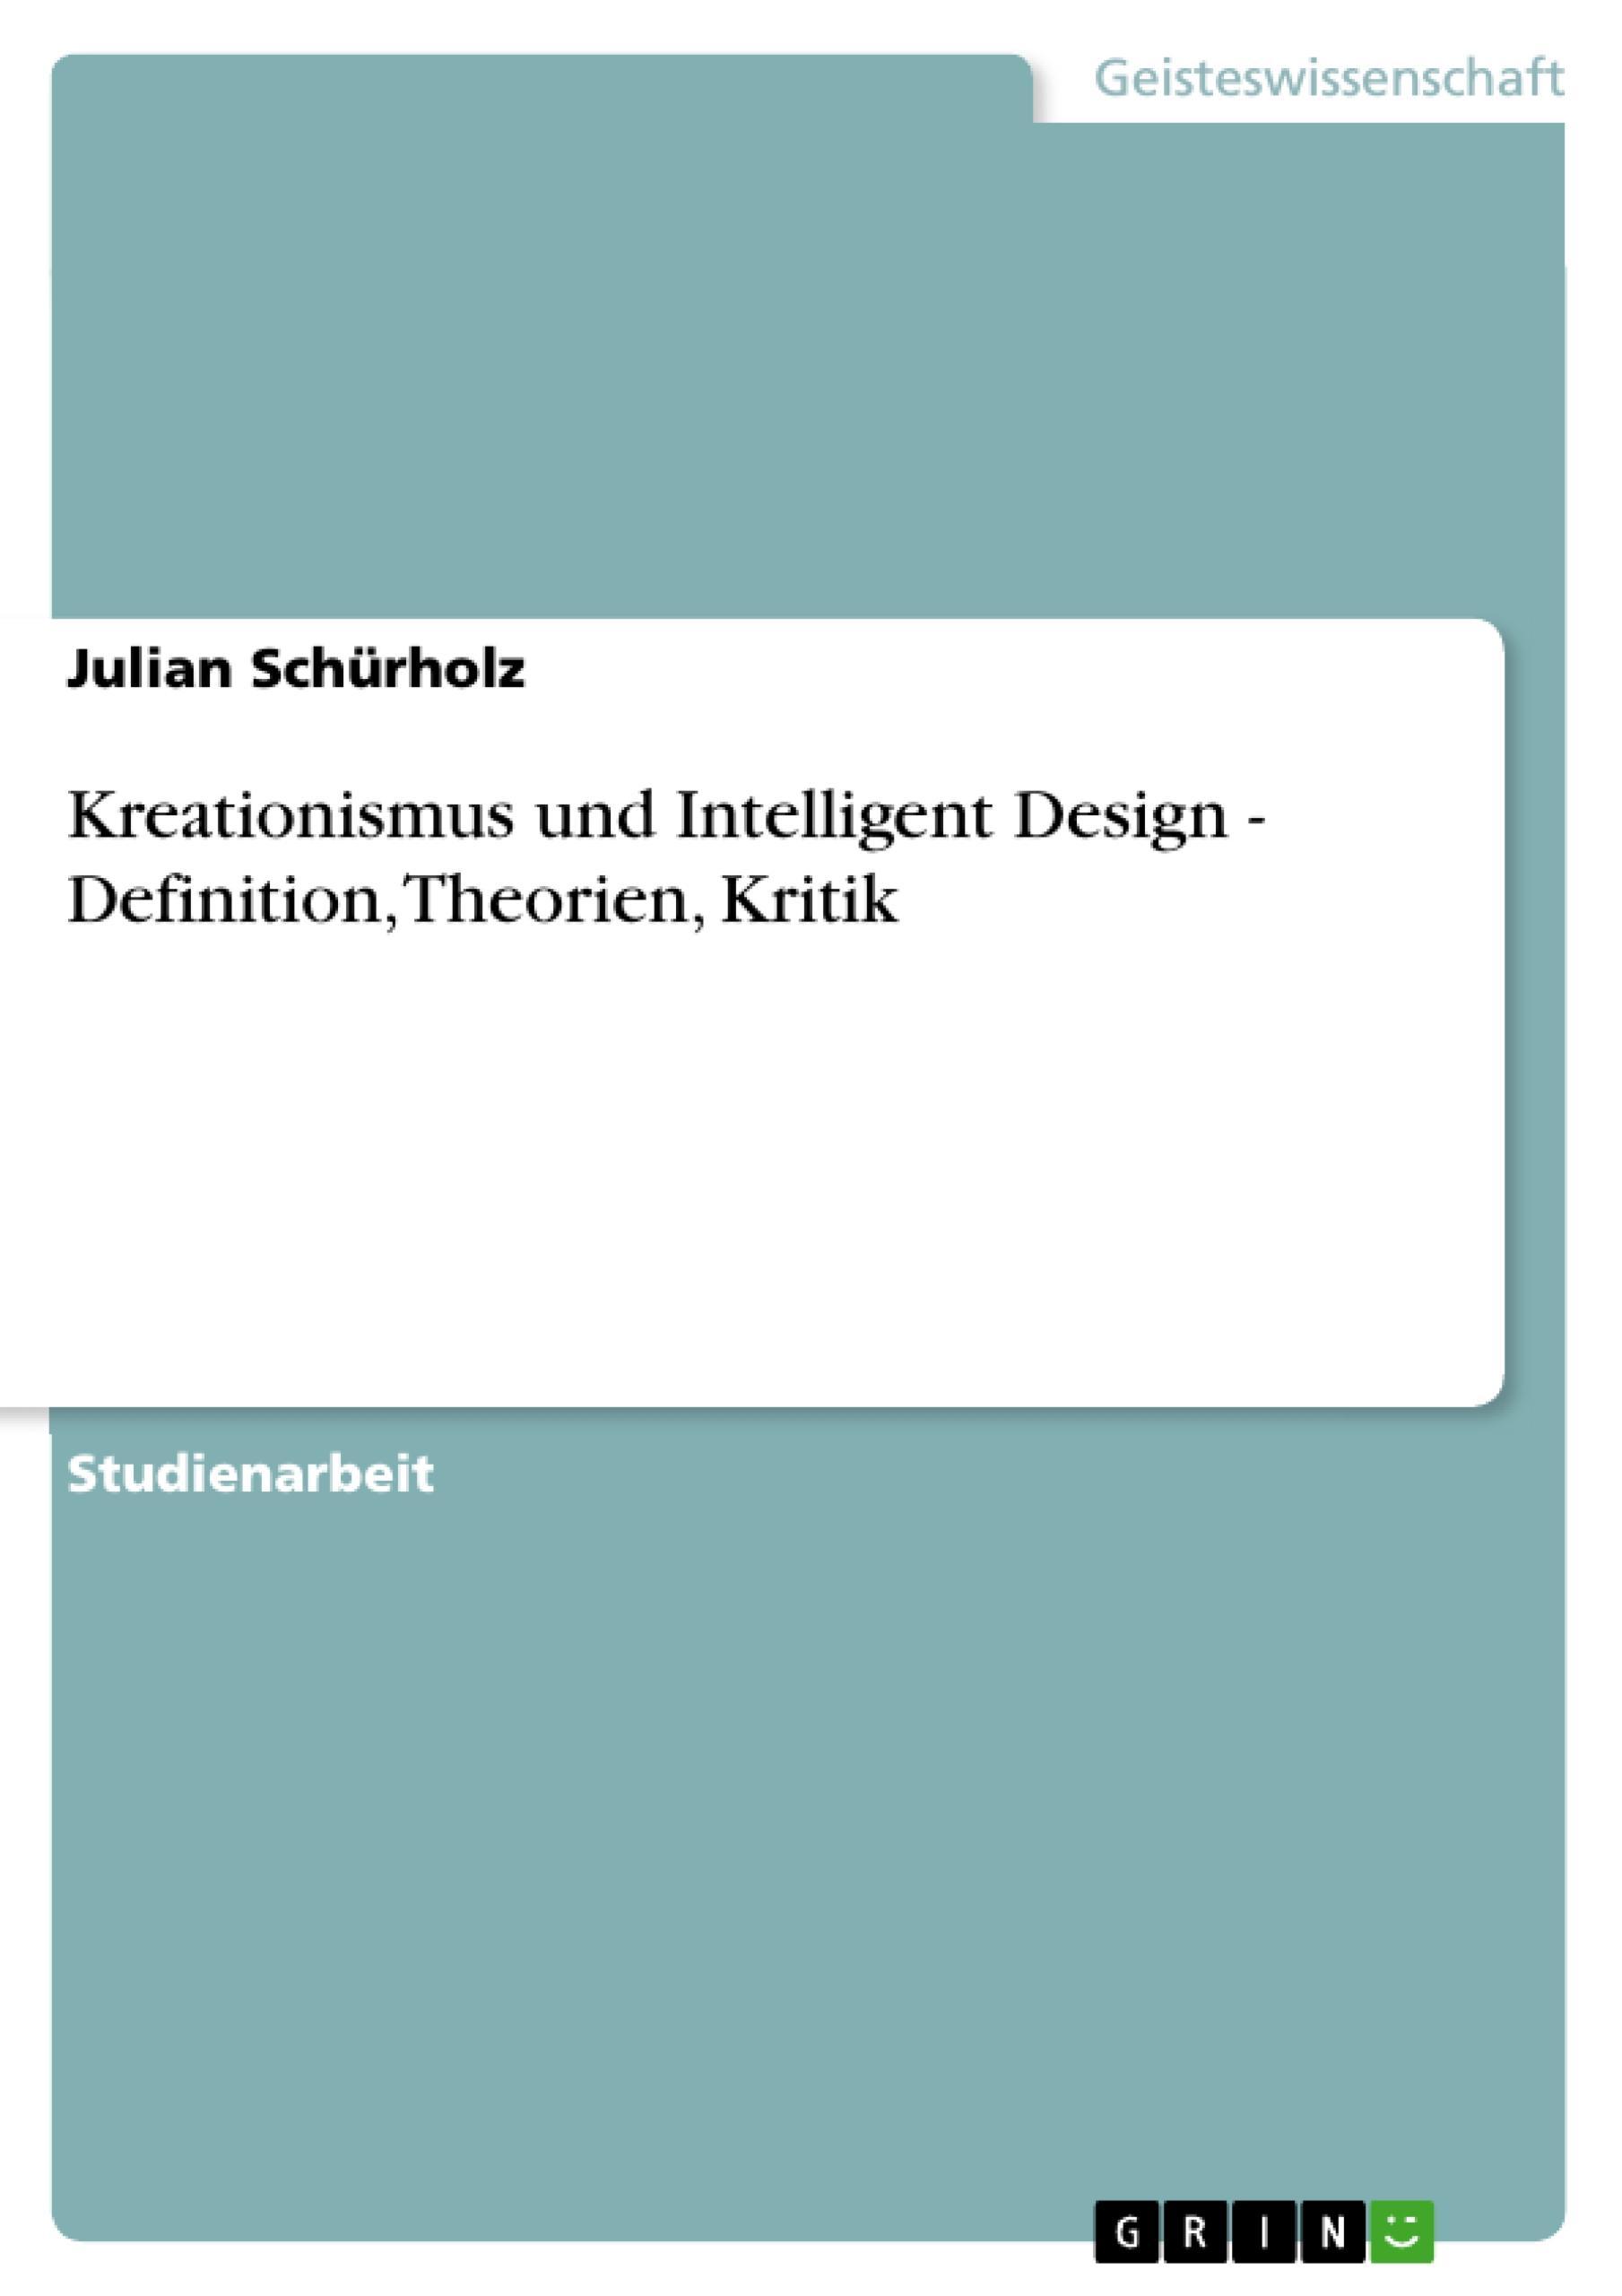 Kreationismus und Intelligent Design - Definition, Theorien, Kritik  Julian Schürholz  Taschenbuch  Deutsch  2010 - Schürholz, Julian